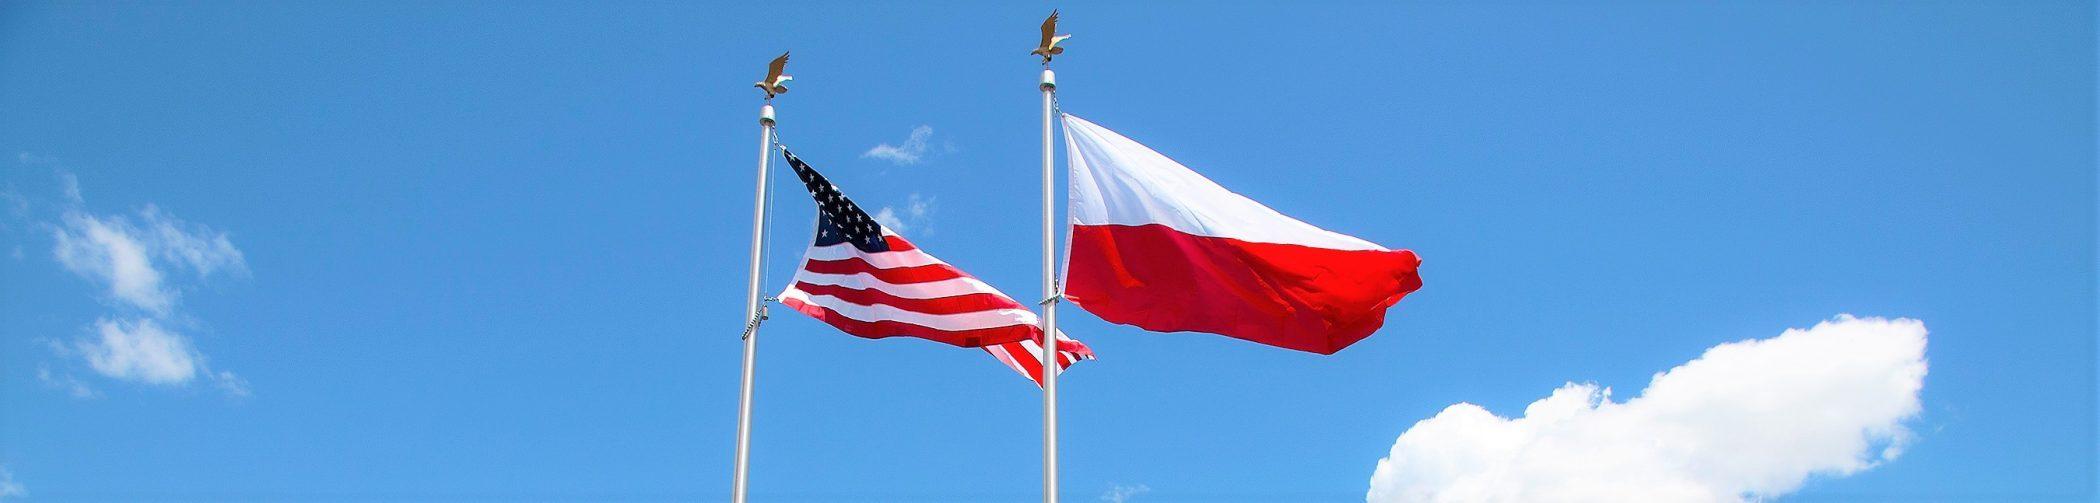 Poland's First Geopolitical Think Tank in Washington